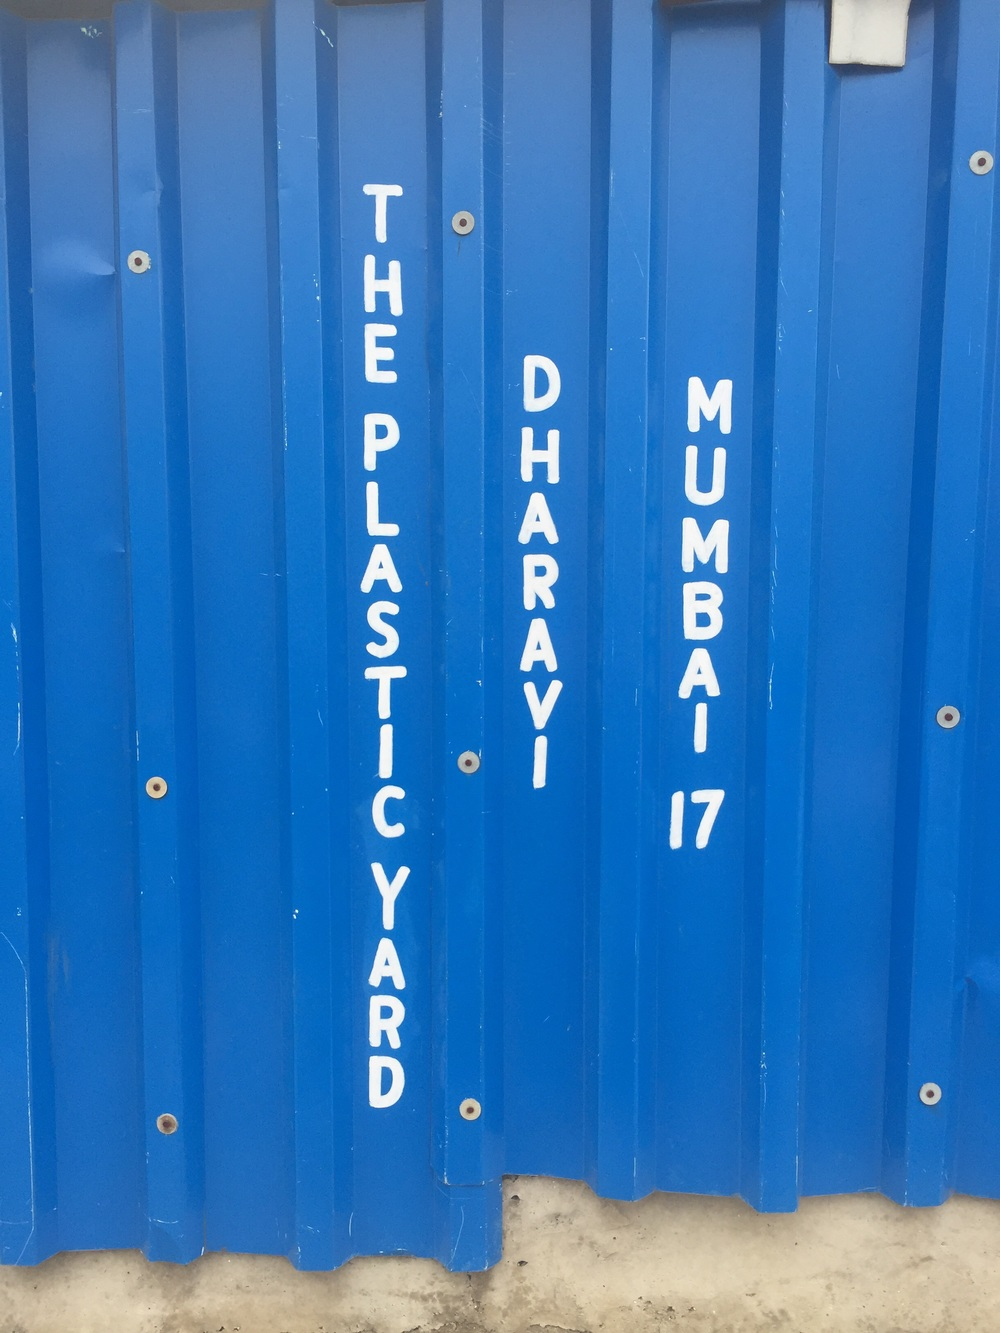 The Plastic Yard at the Dharavi Slum